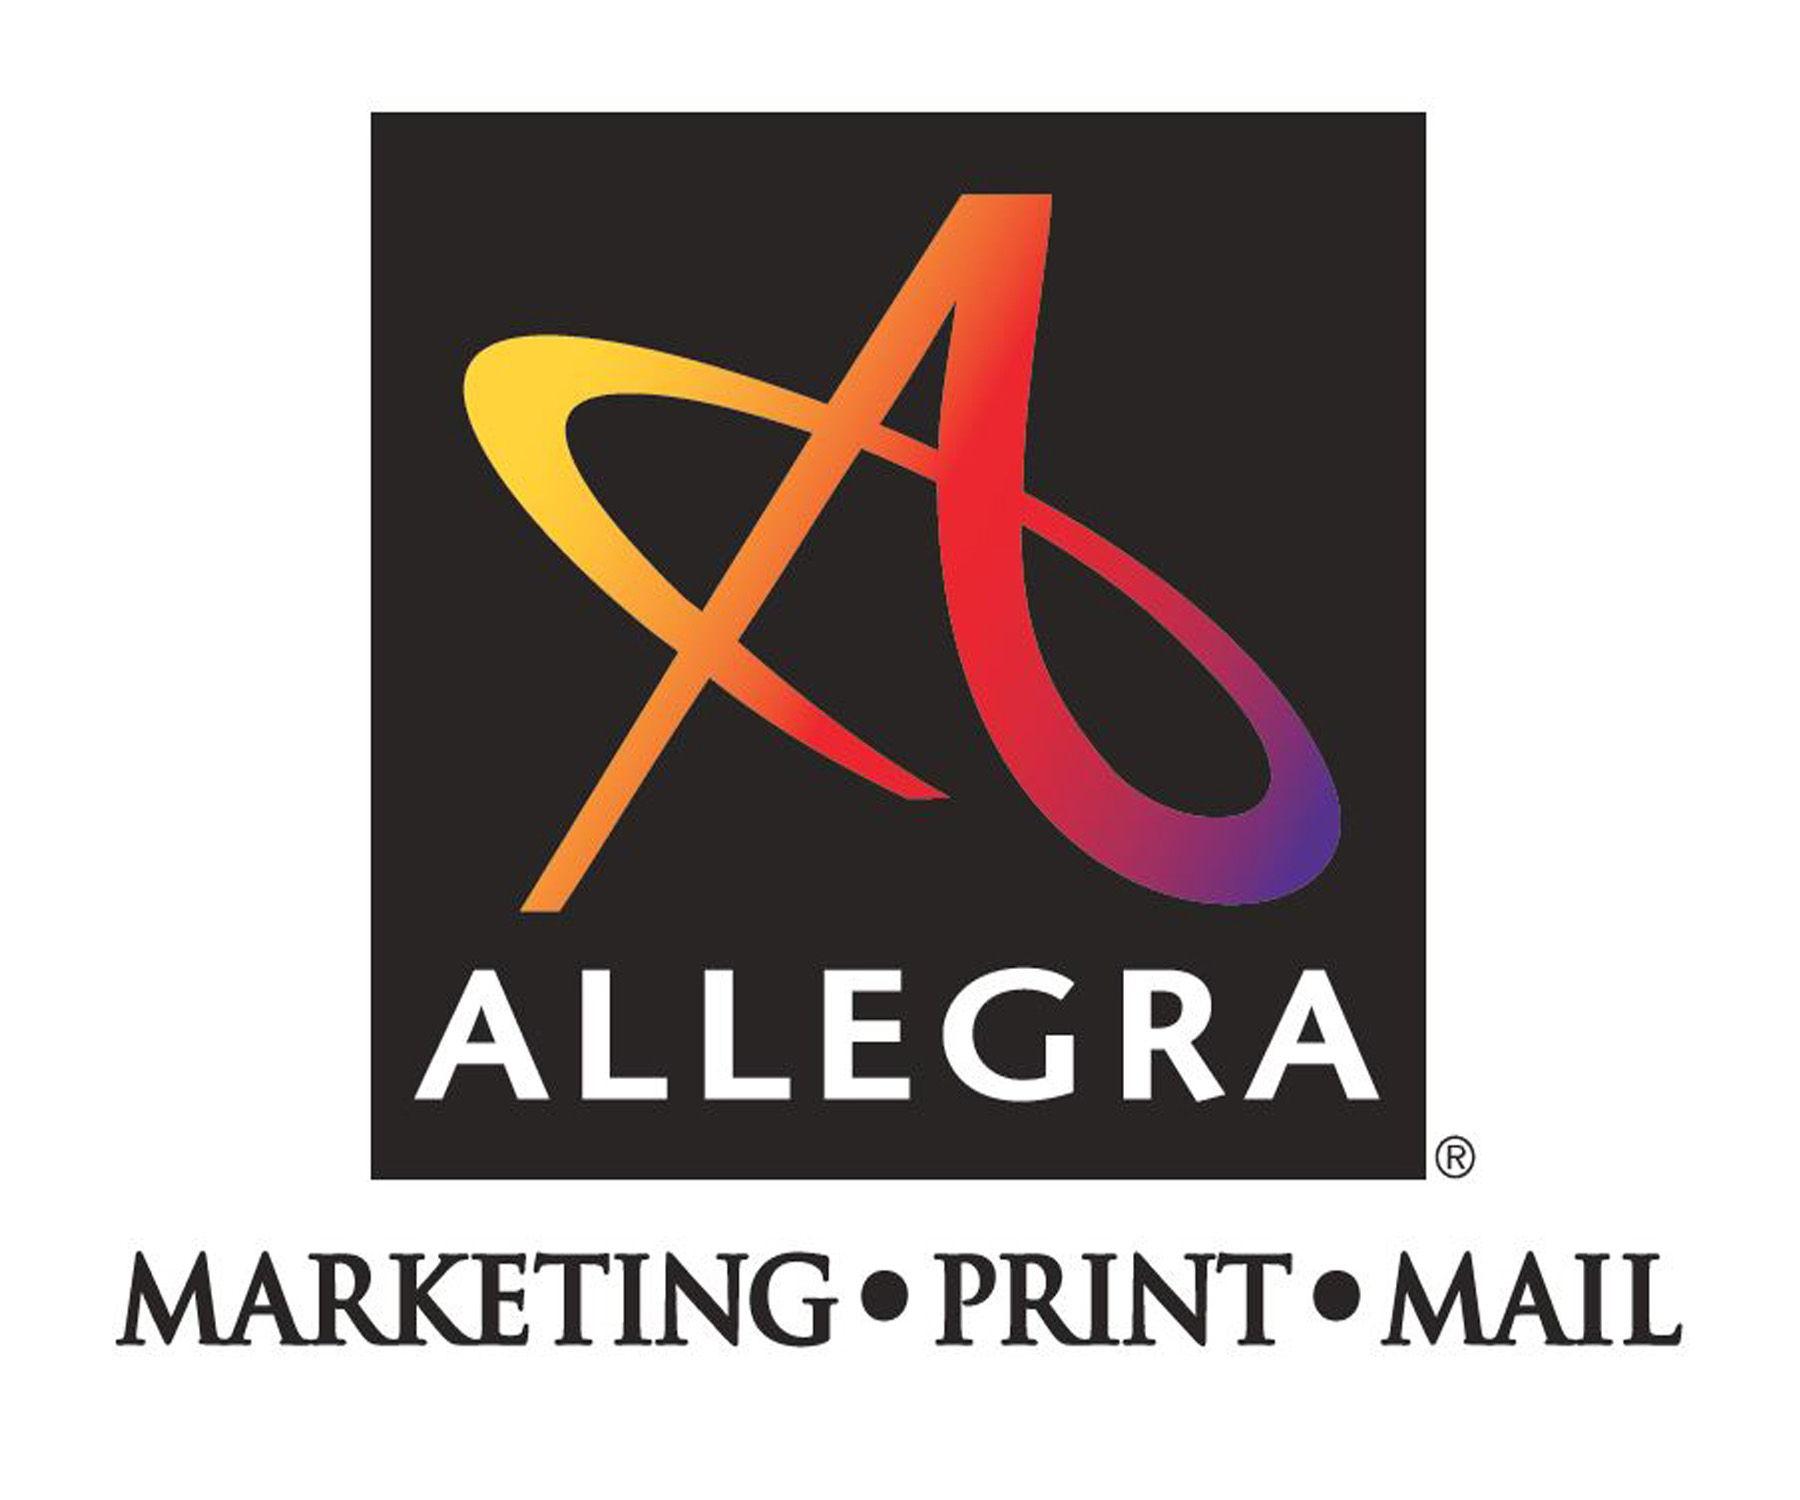 https://www.allegramarketingprint.com/locations/billings-mt/